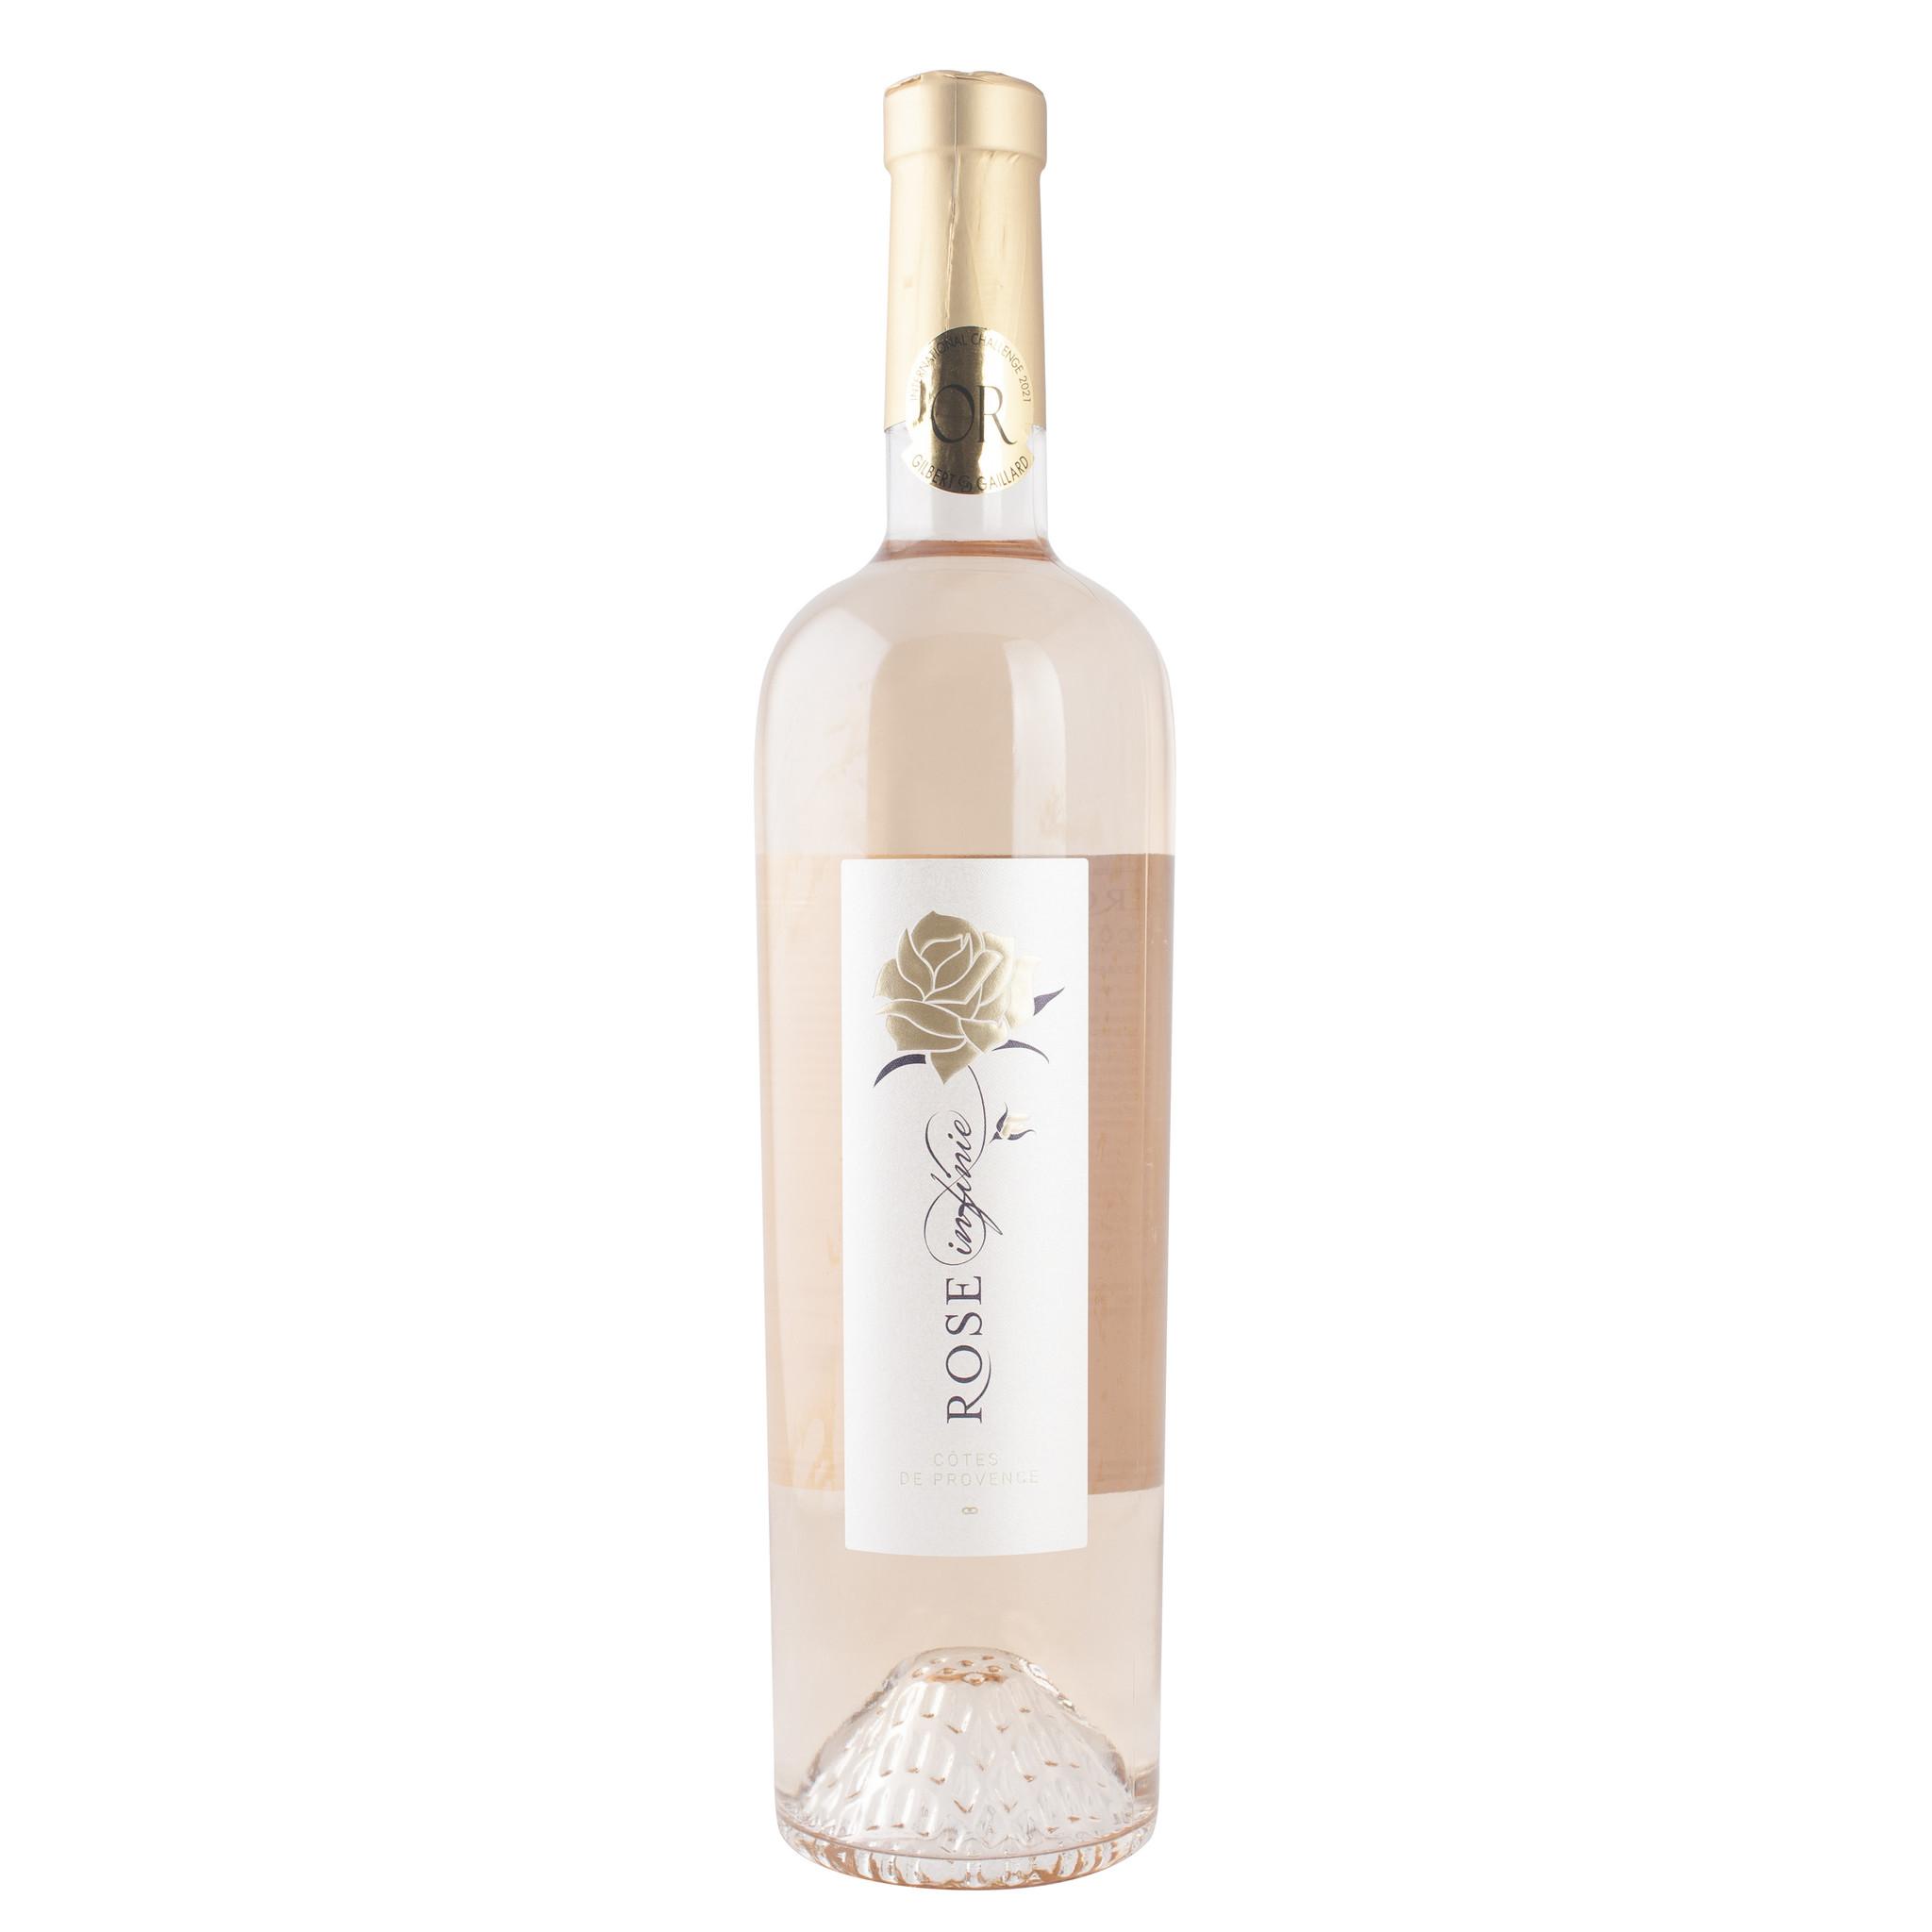 Rose Infinie Cotes de Provence Rosé 2020